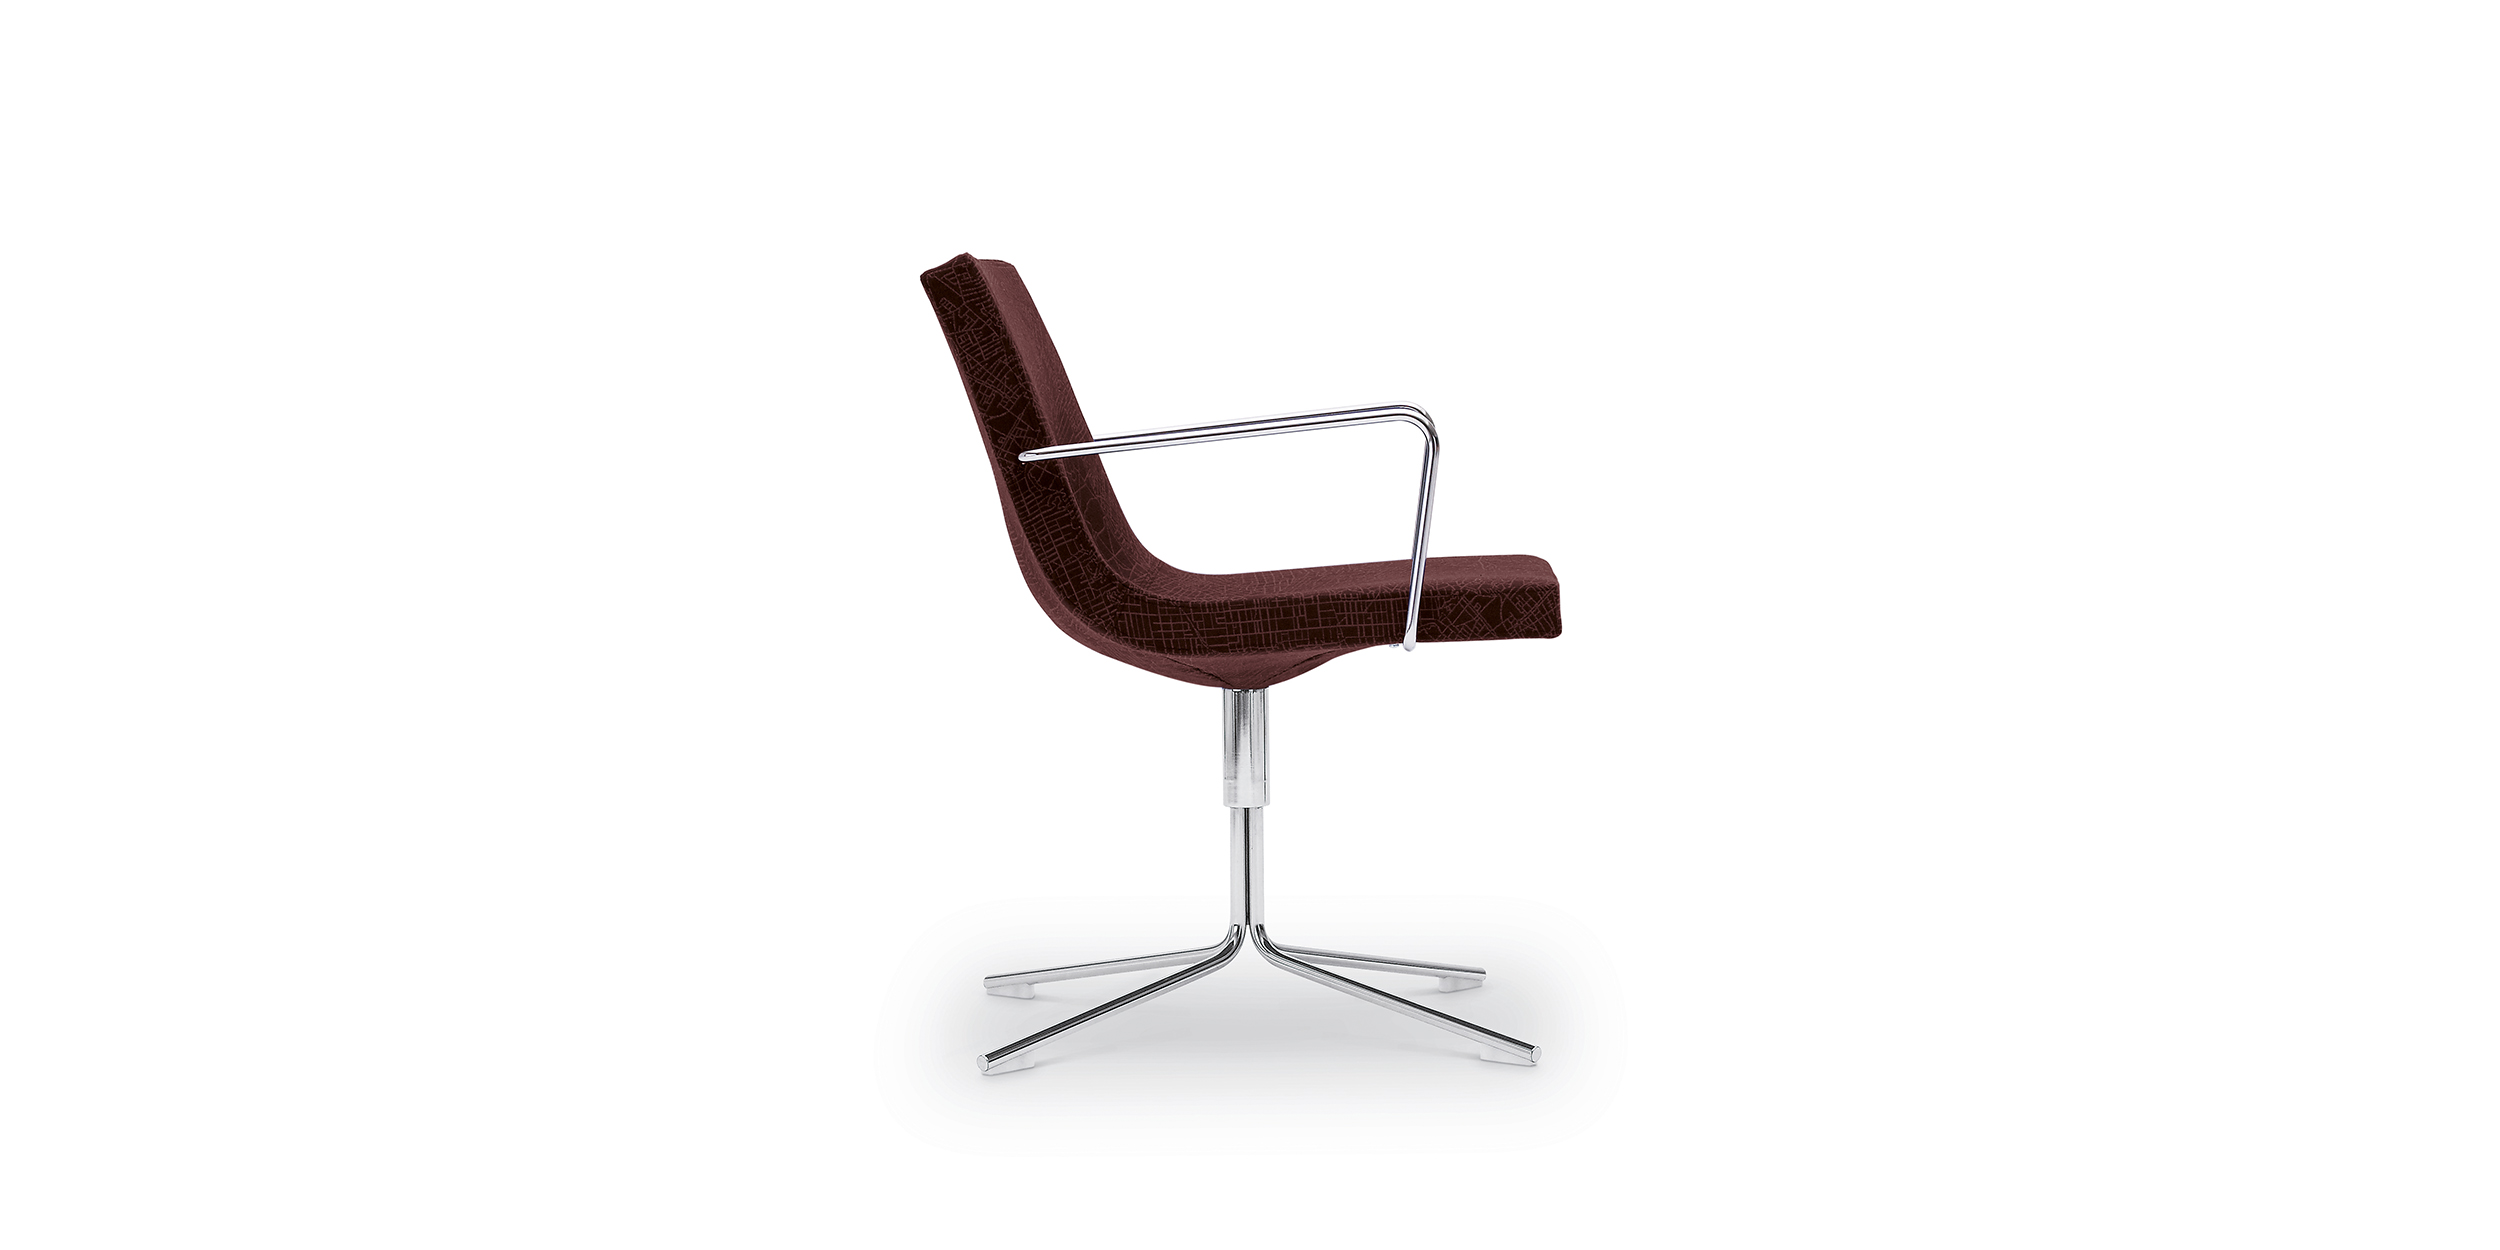 Bond, 4-cross armchair by Jean-Marie Massaud